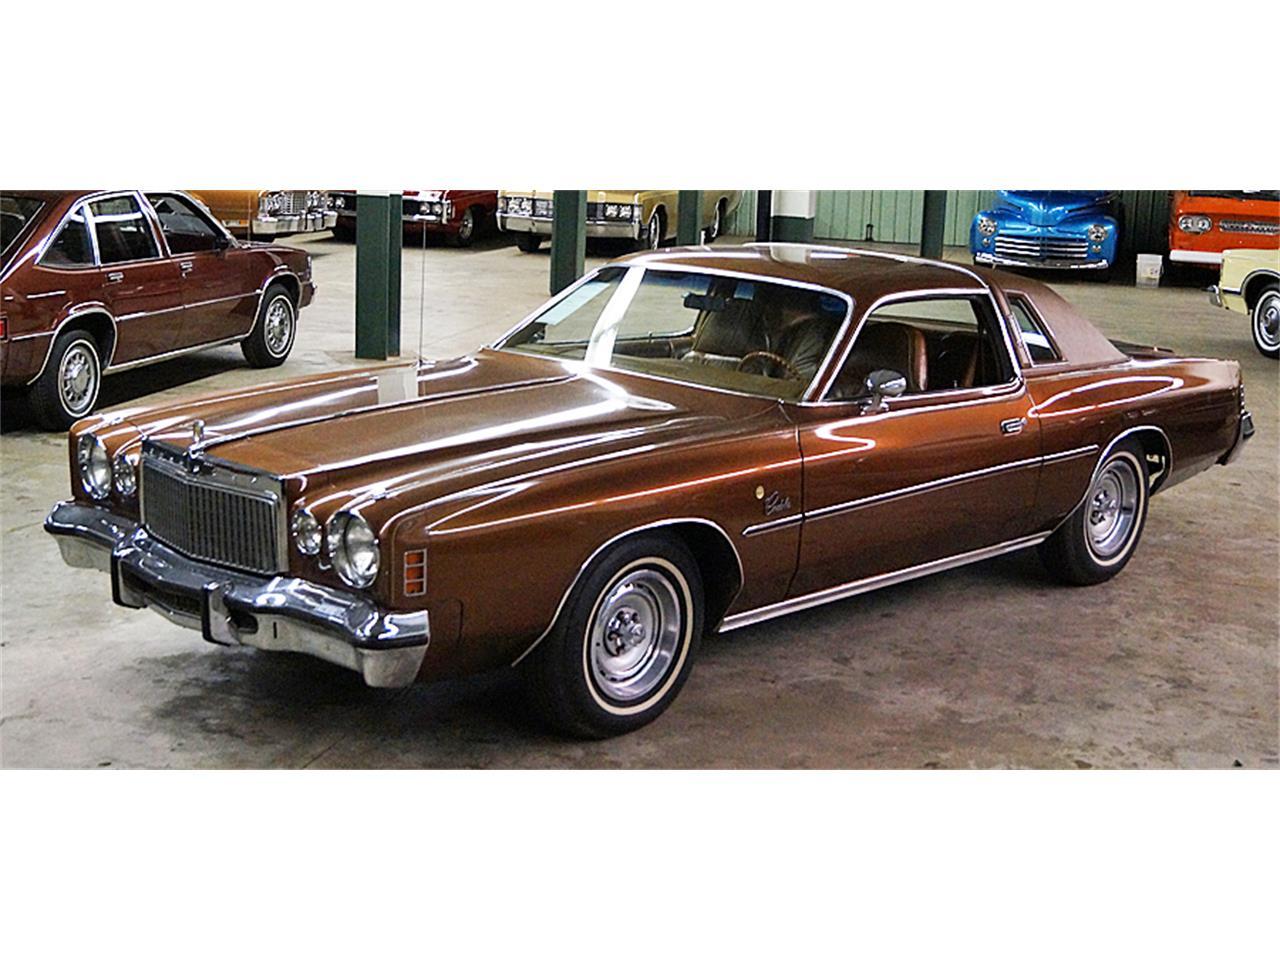 1977 Chrysler Cordoba Wiring Diagram Schematics For Sale Classiccars Com Cc 959400 Speedometer